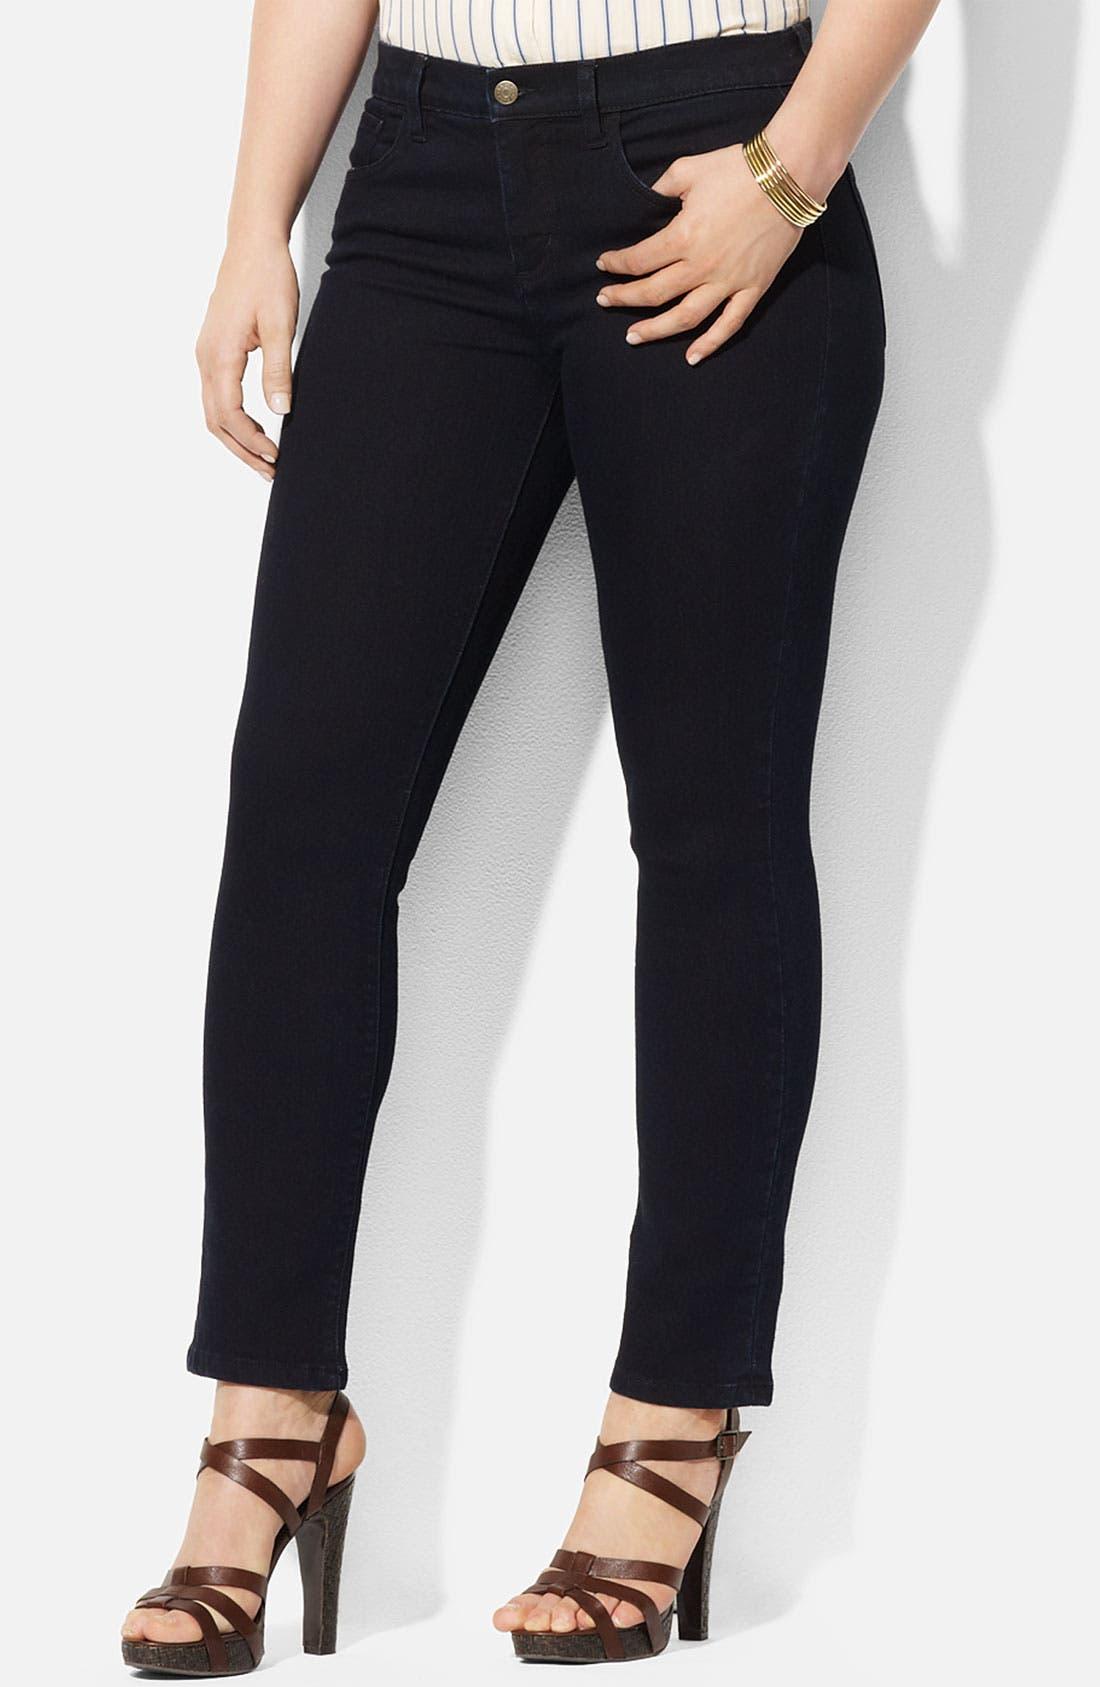 Alternate Image 1 Selected - Lauren Ralph Lauren Straight Leg Ankle Pants (Plus)